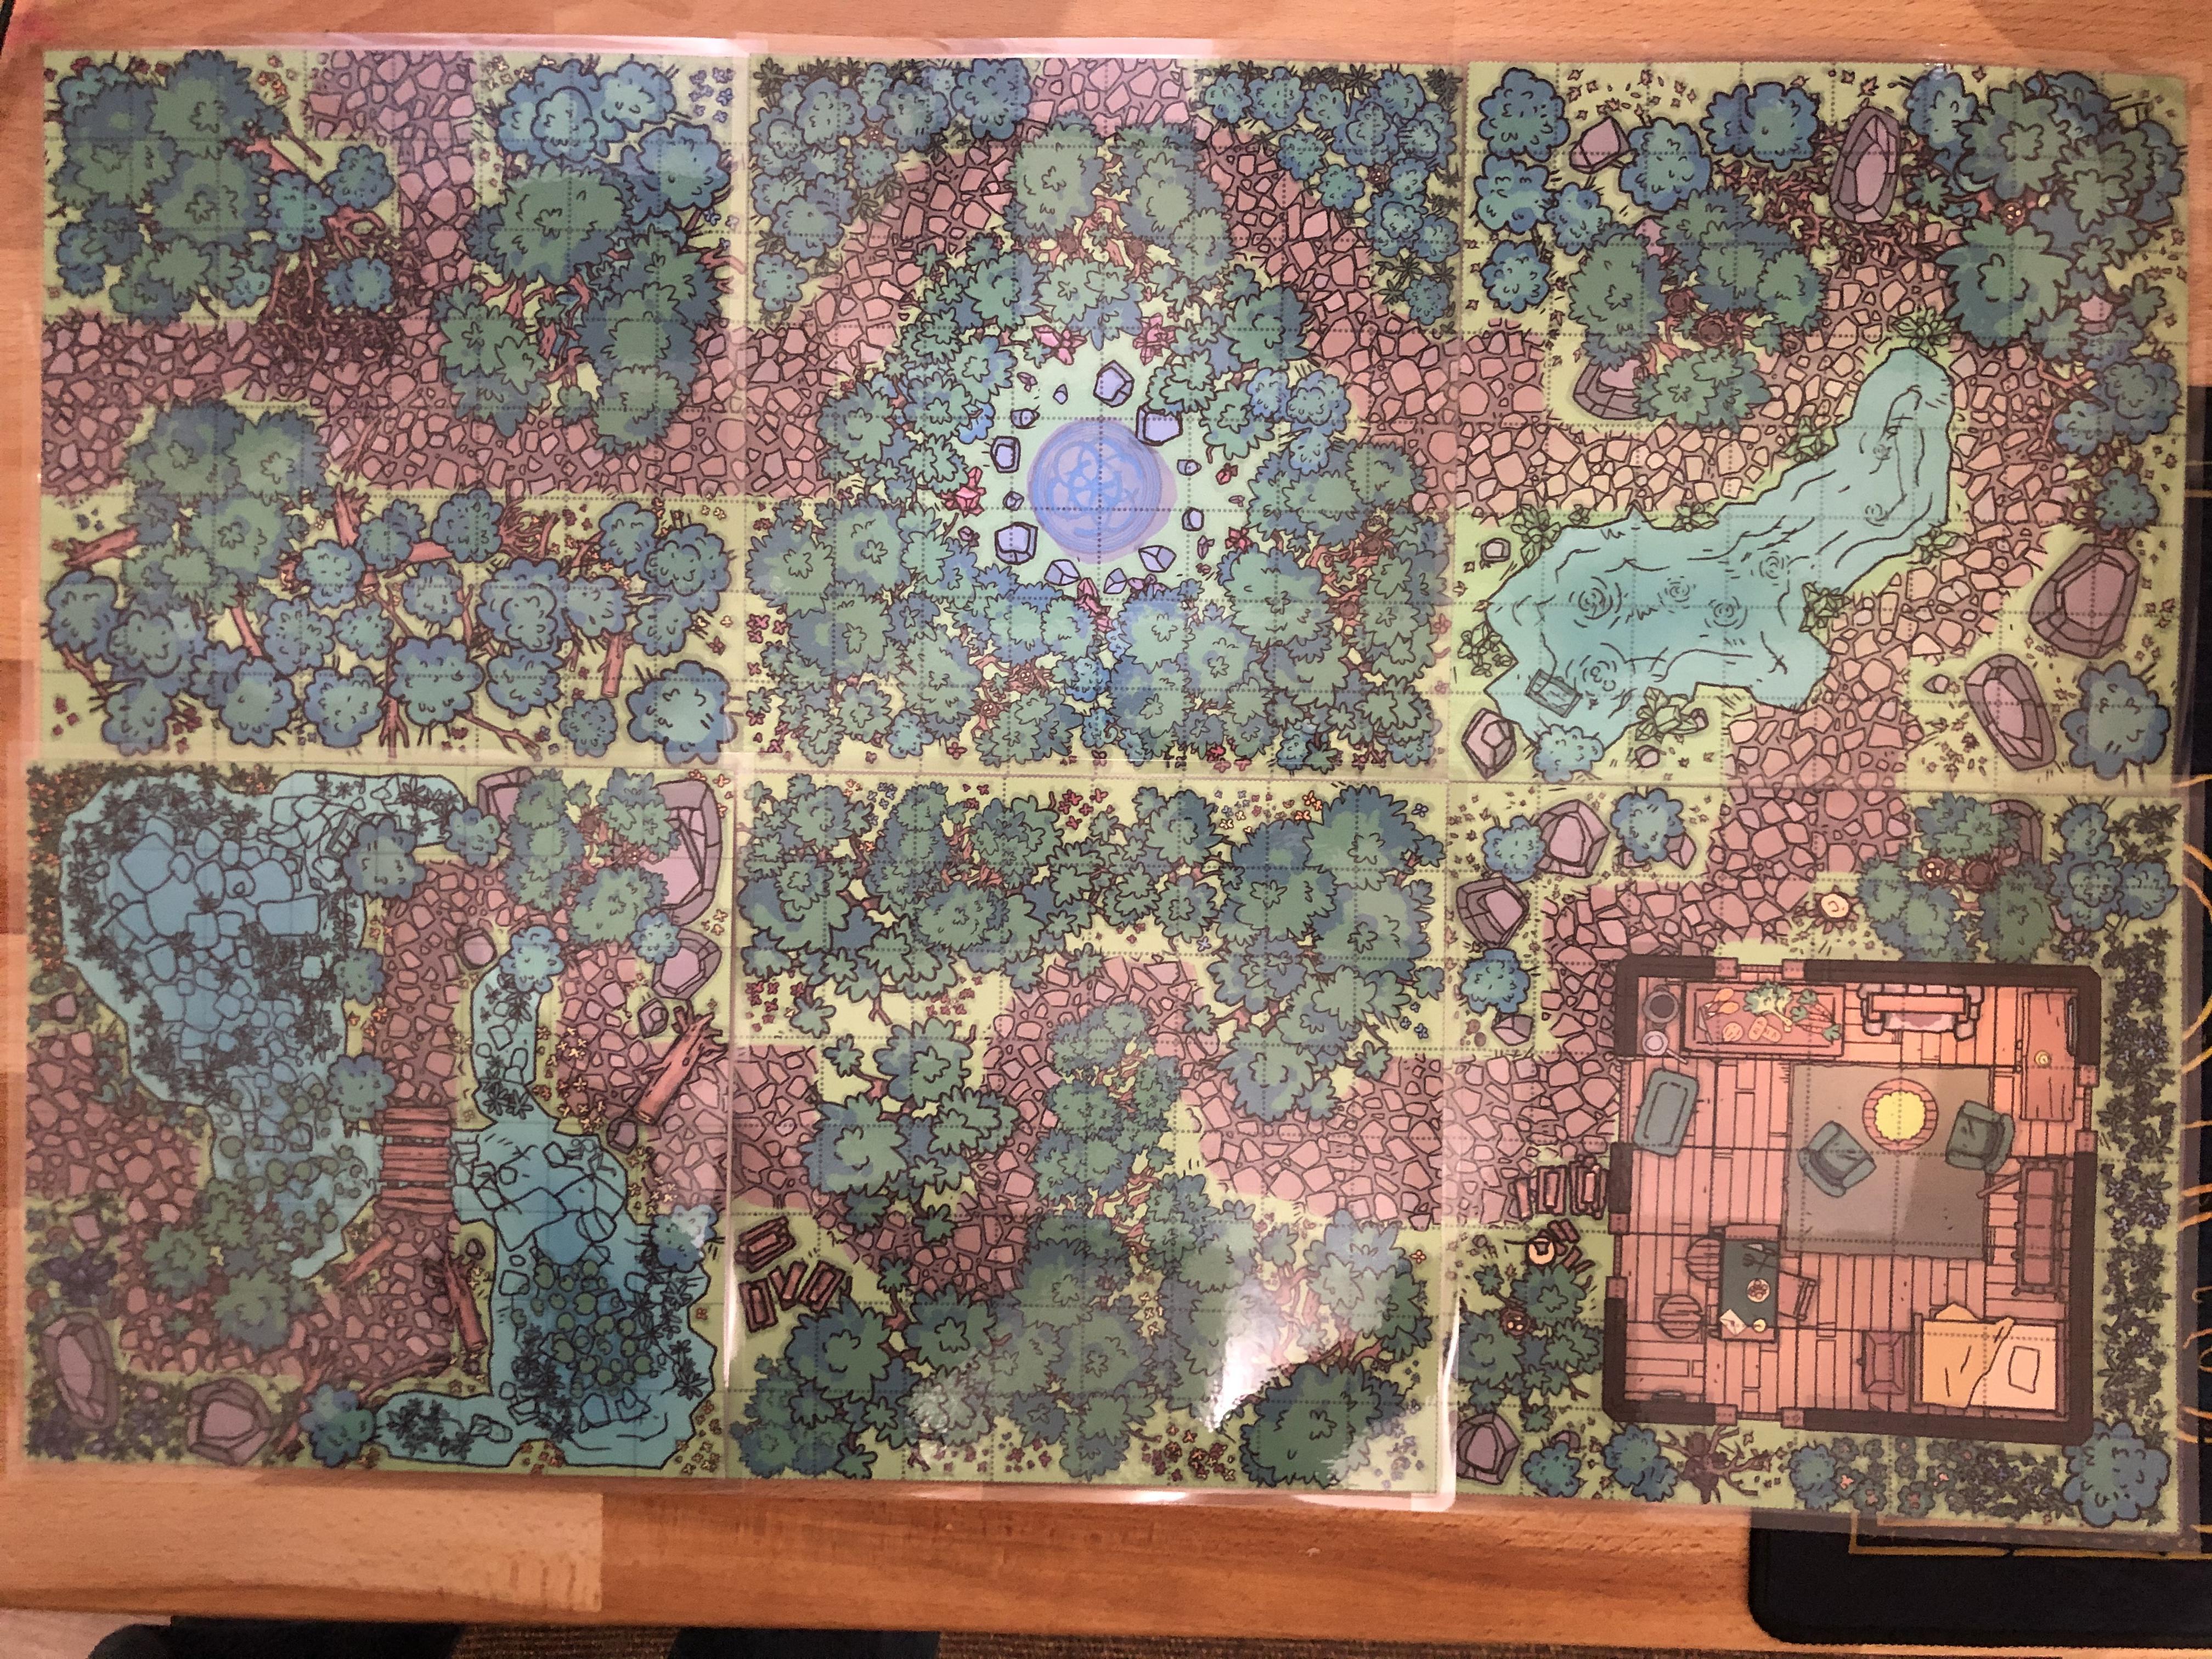 creating 8x8 tiles to print and